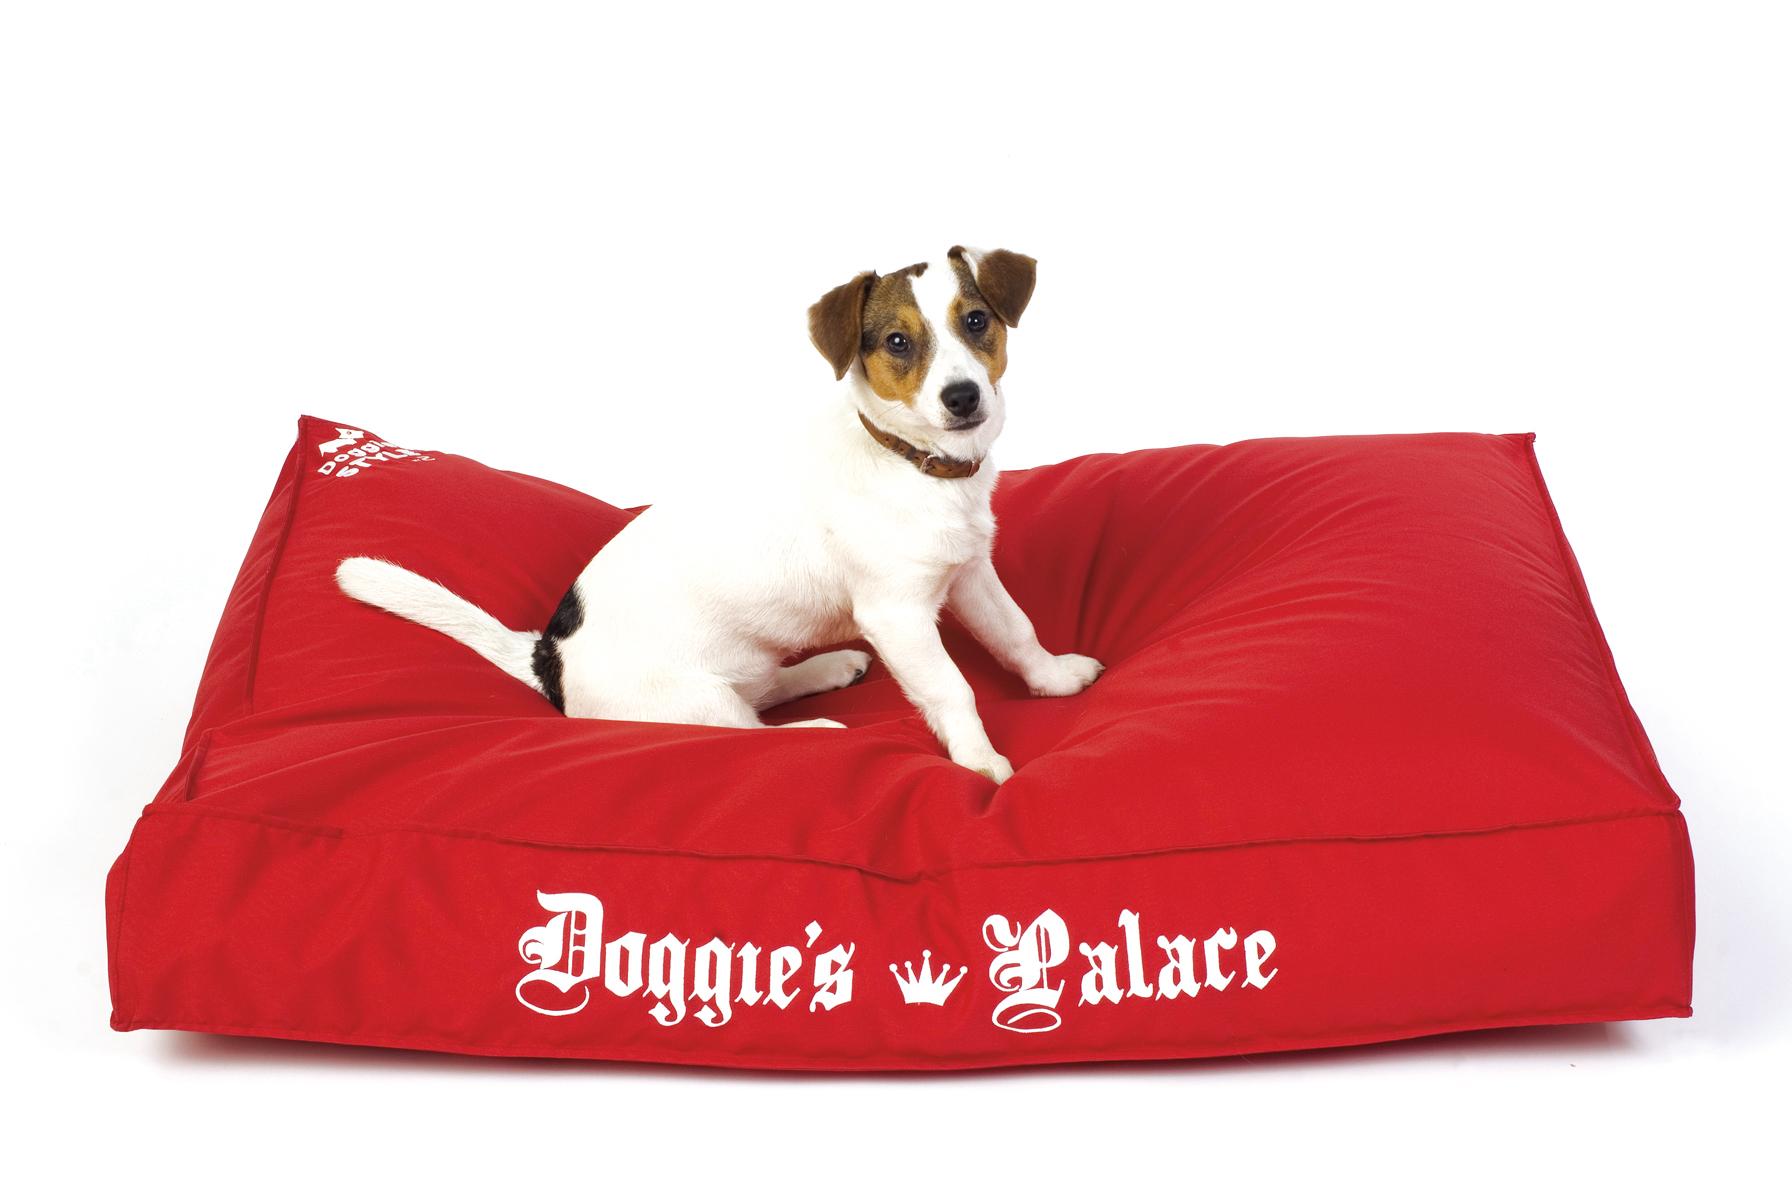 Doggie palace